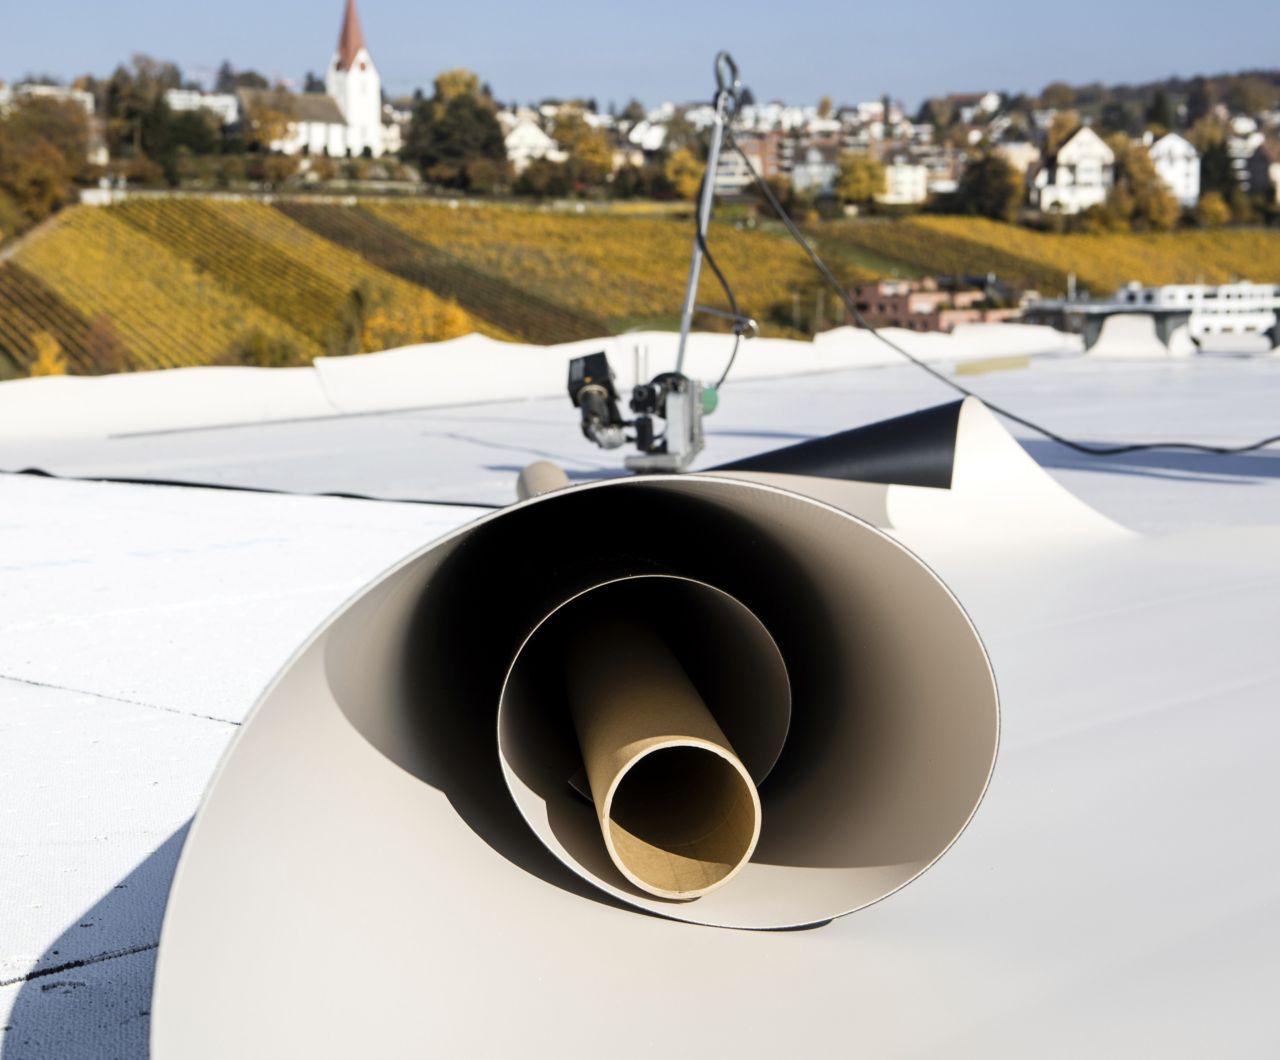 Waterproofing membrane applied on a roof